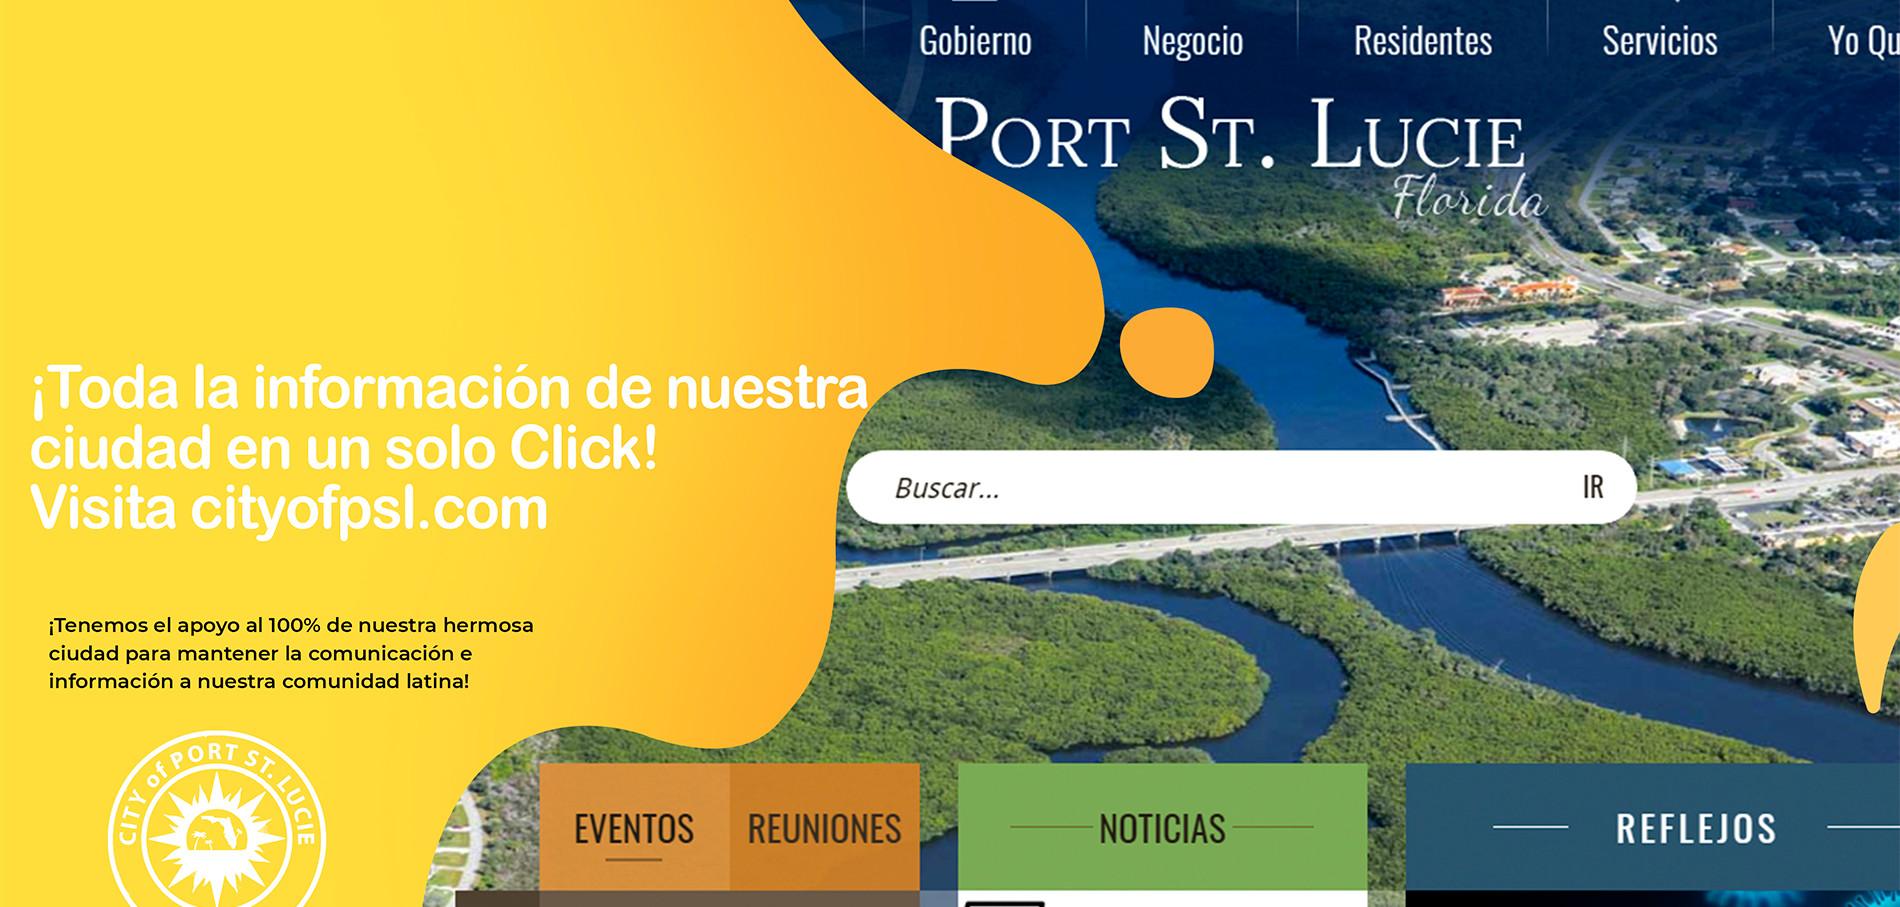 Port St Lucie Florida